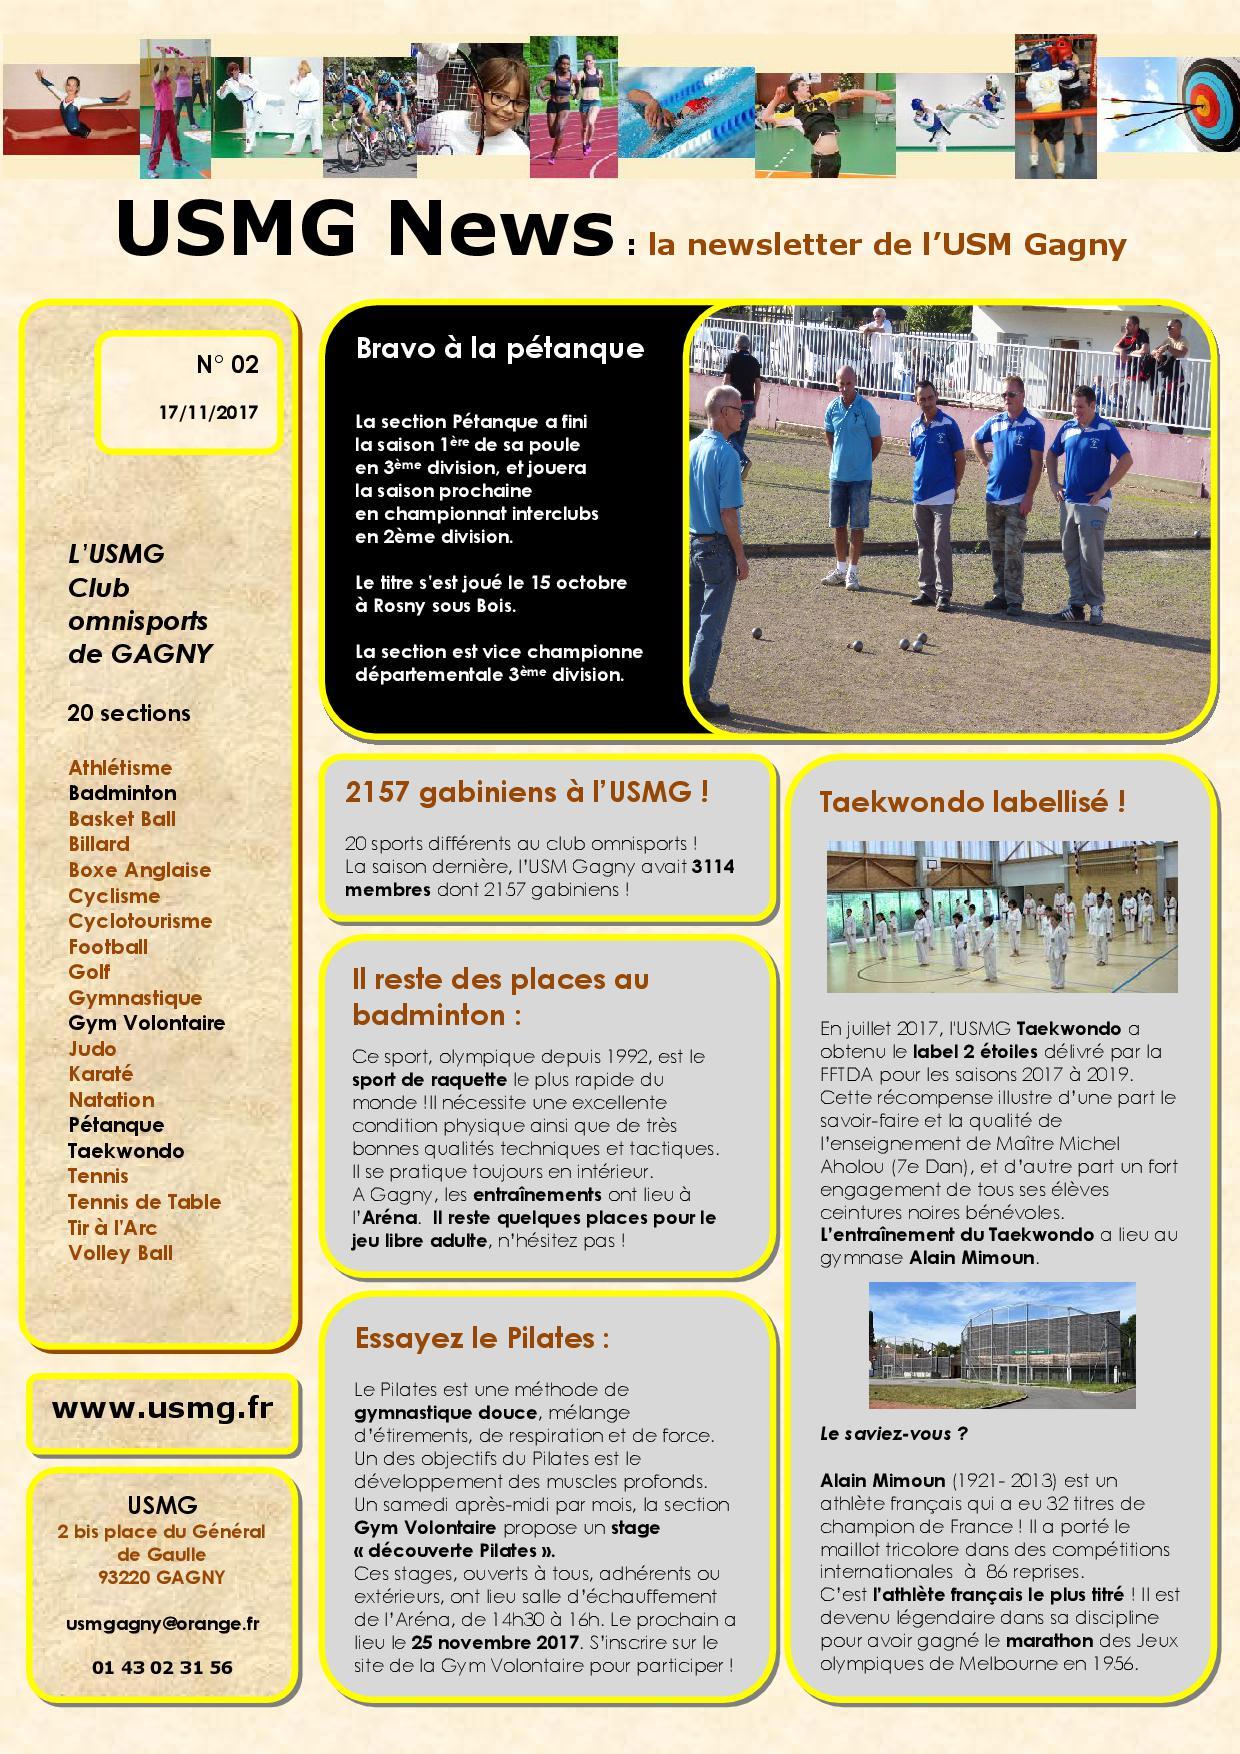 Usmg news 02